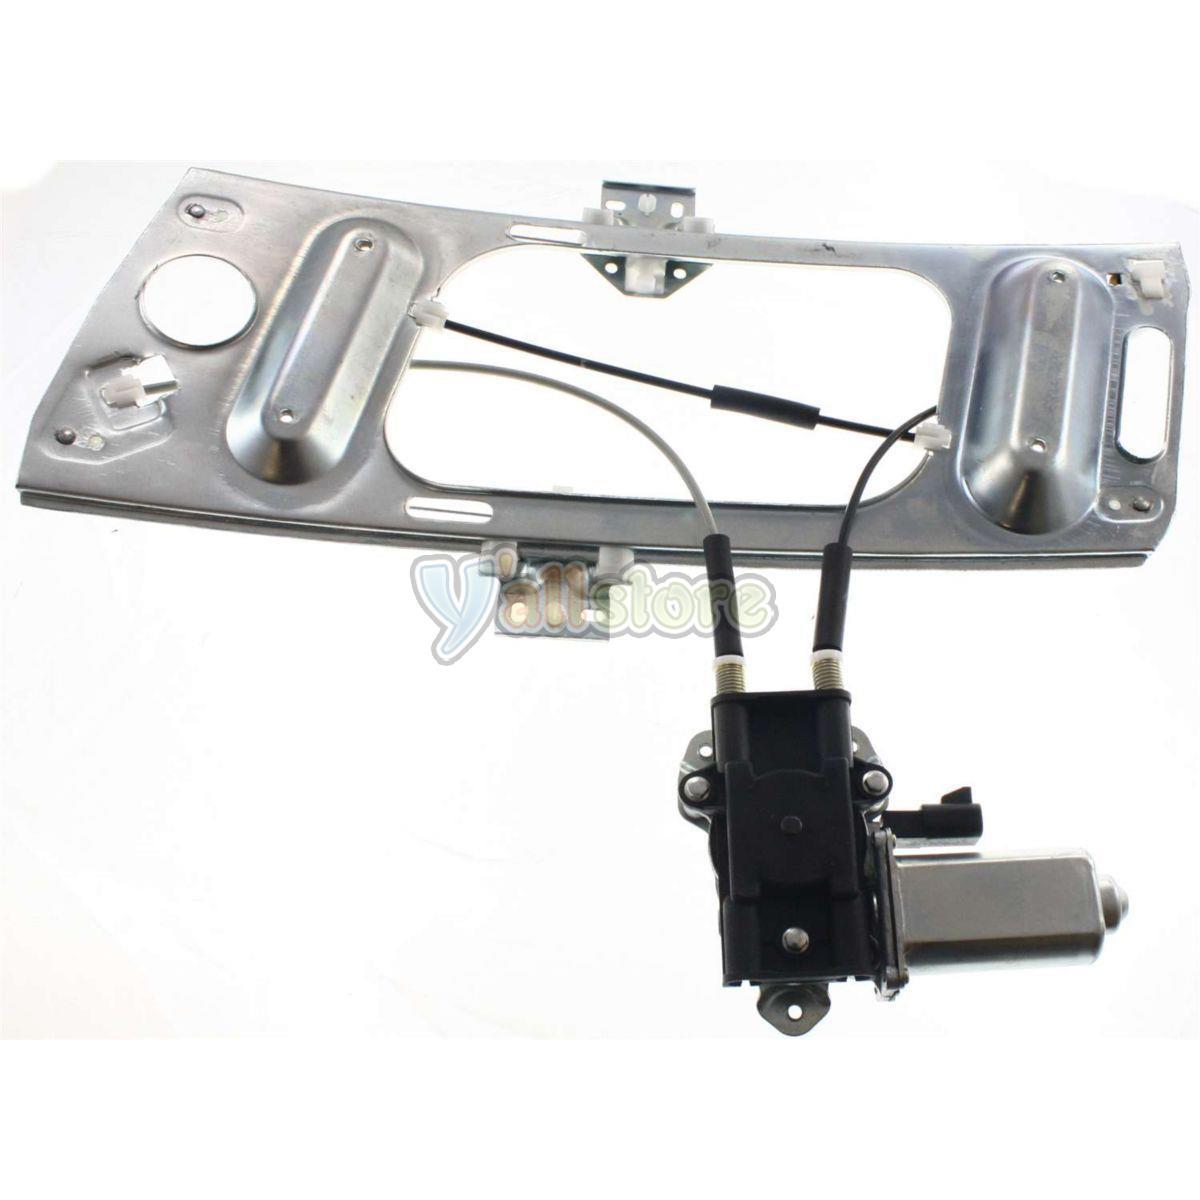 set of 10 Lug Bolts 14x1.5 28mm Shank Length Chrome Lugs Cone Seat Type qqvv